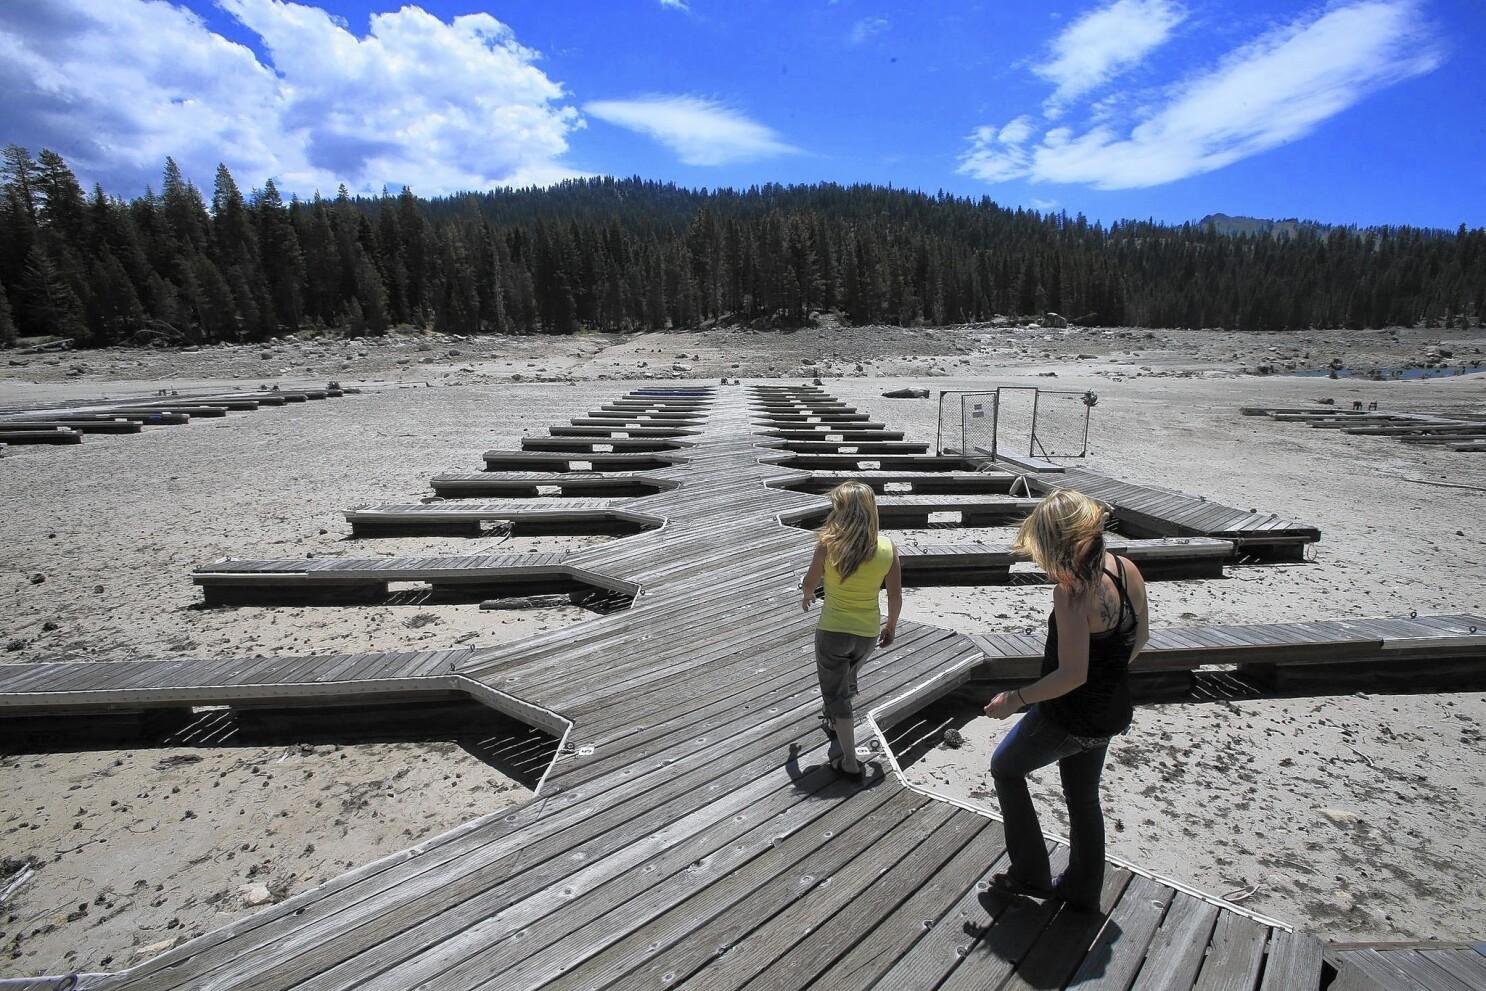 Huntington Lake Summer Fun Drying Up In California Drought Los Angeles Times